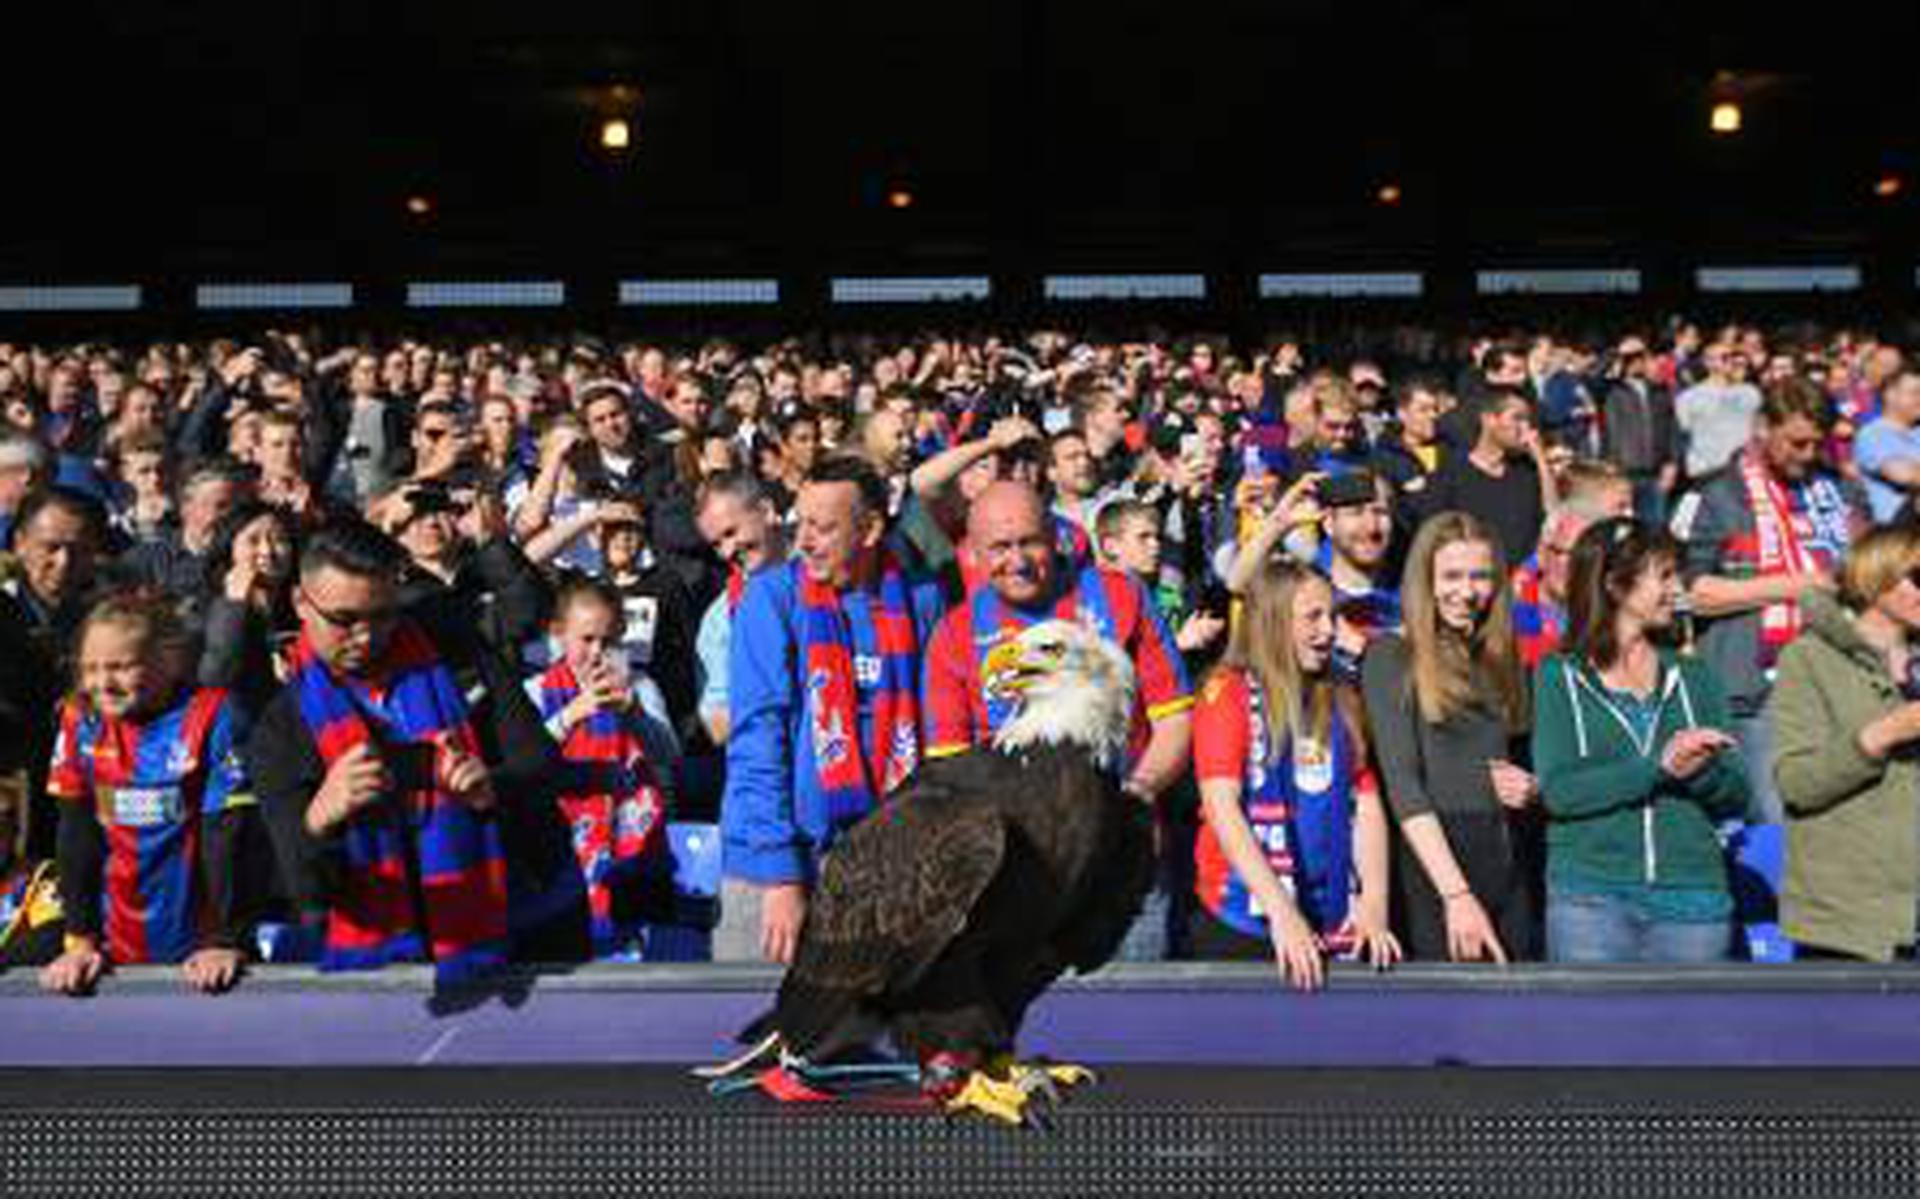 Crystal Palace expands Selhurst Park